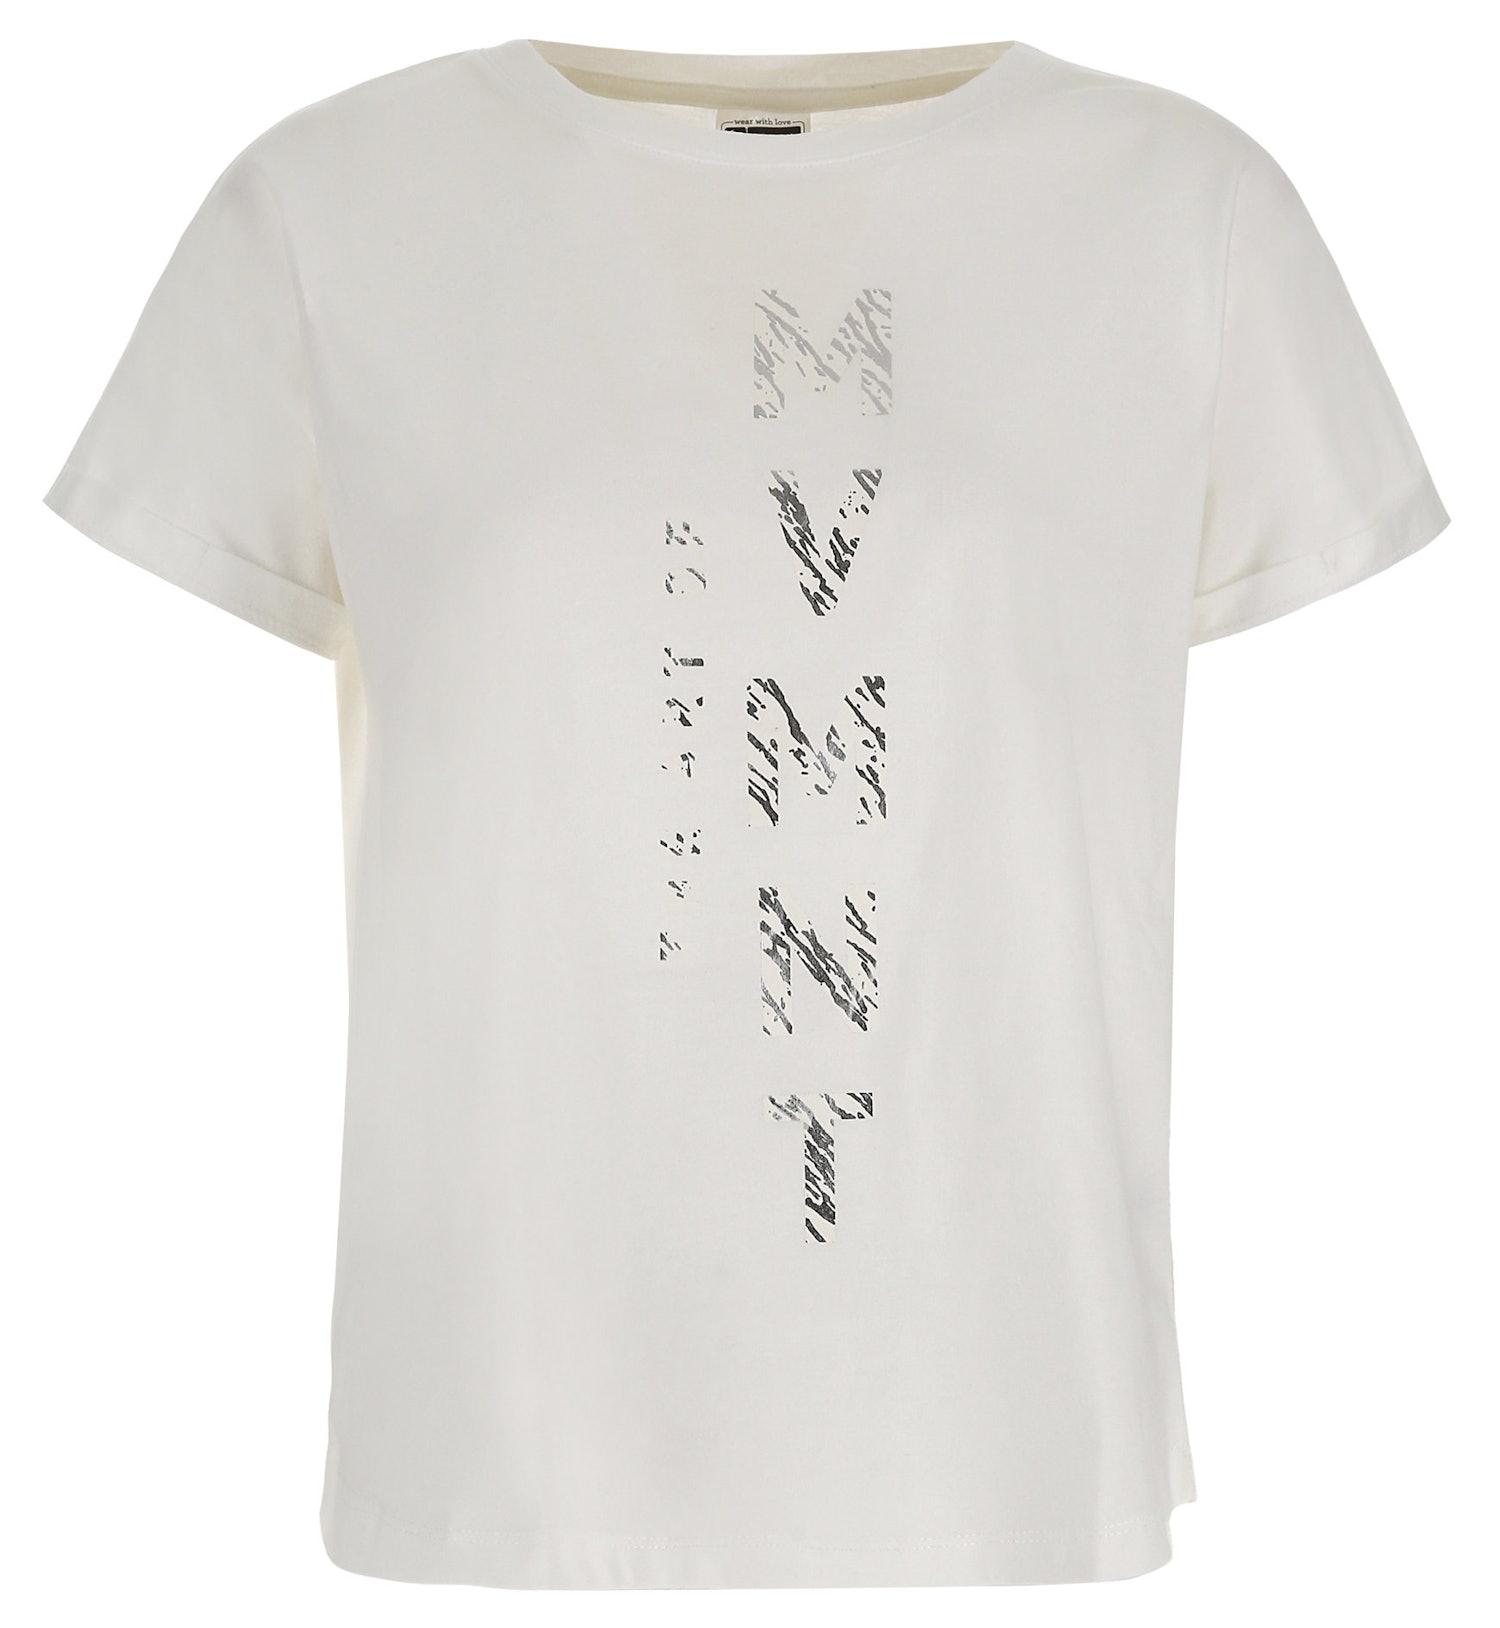 Freddy Shirt Apparel - T-shirt fitness - donna